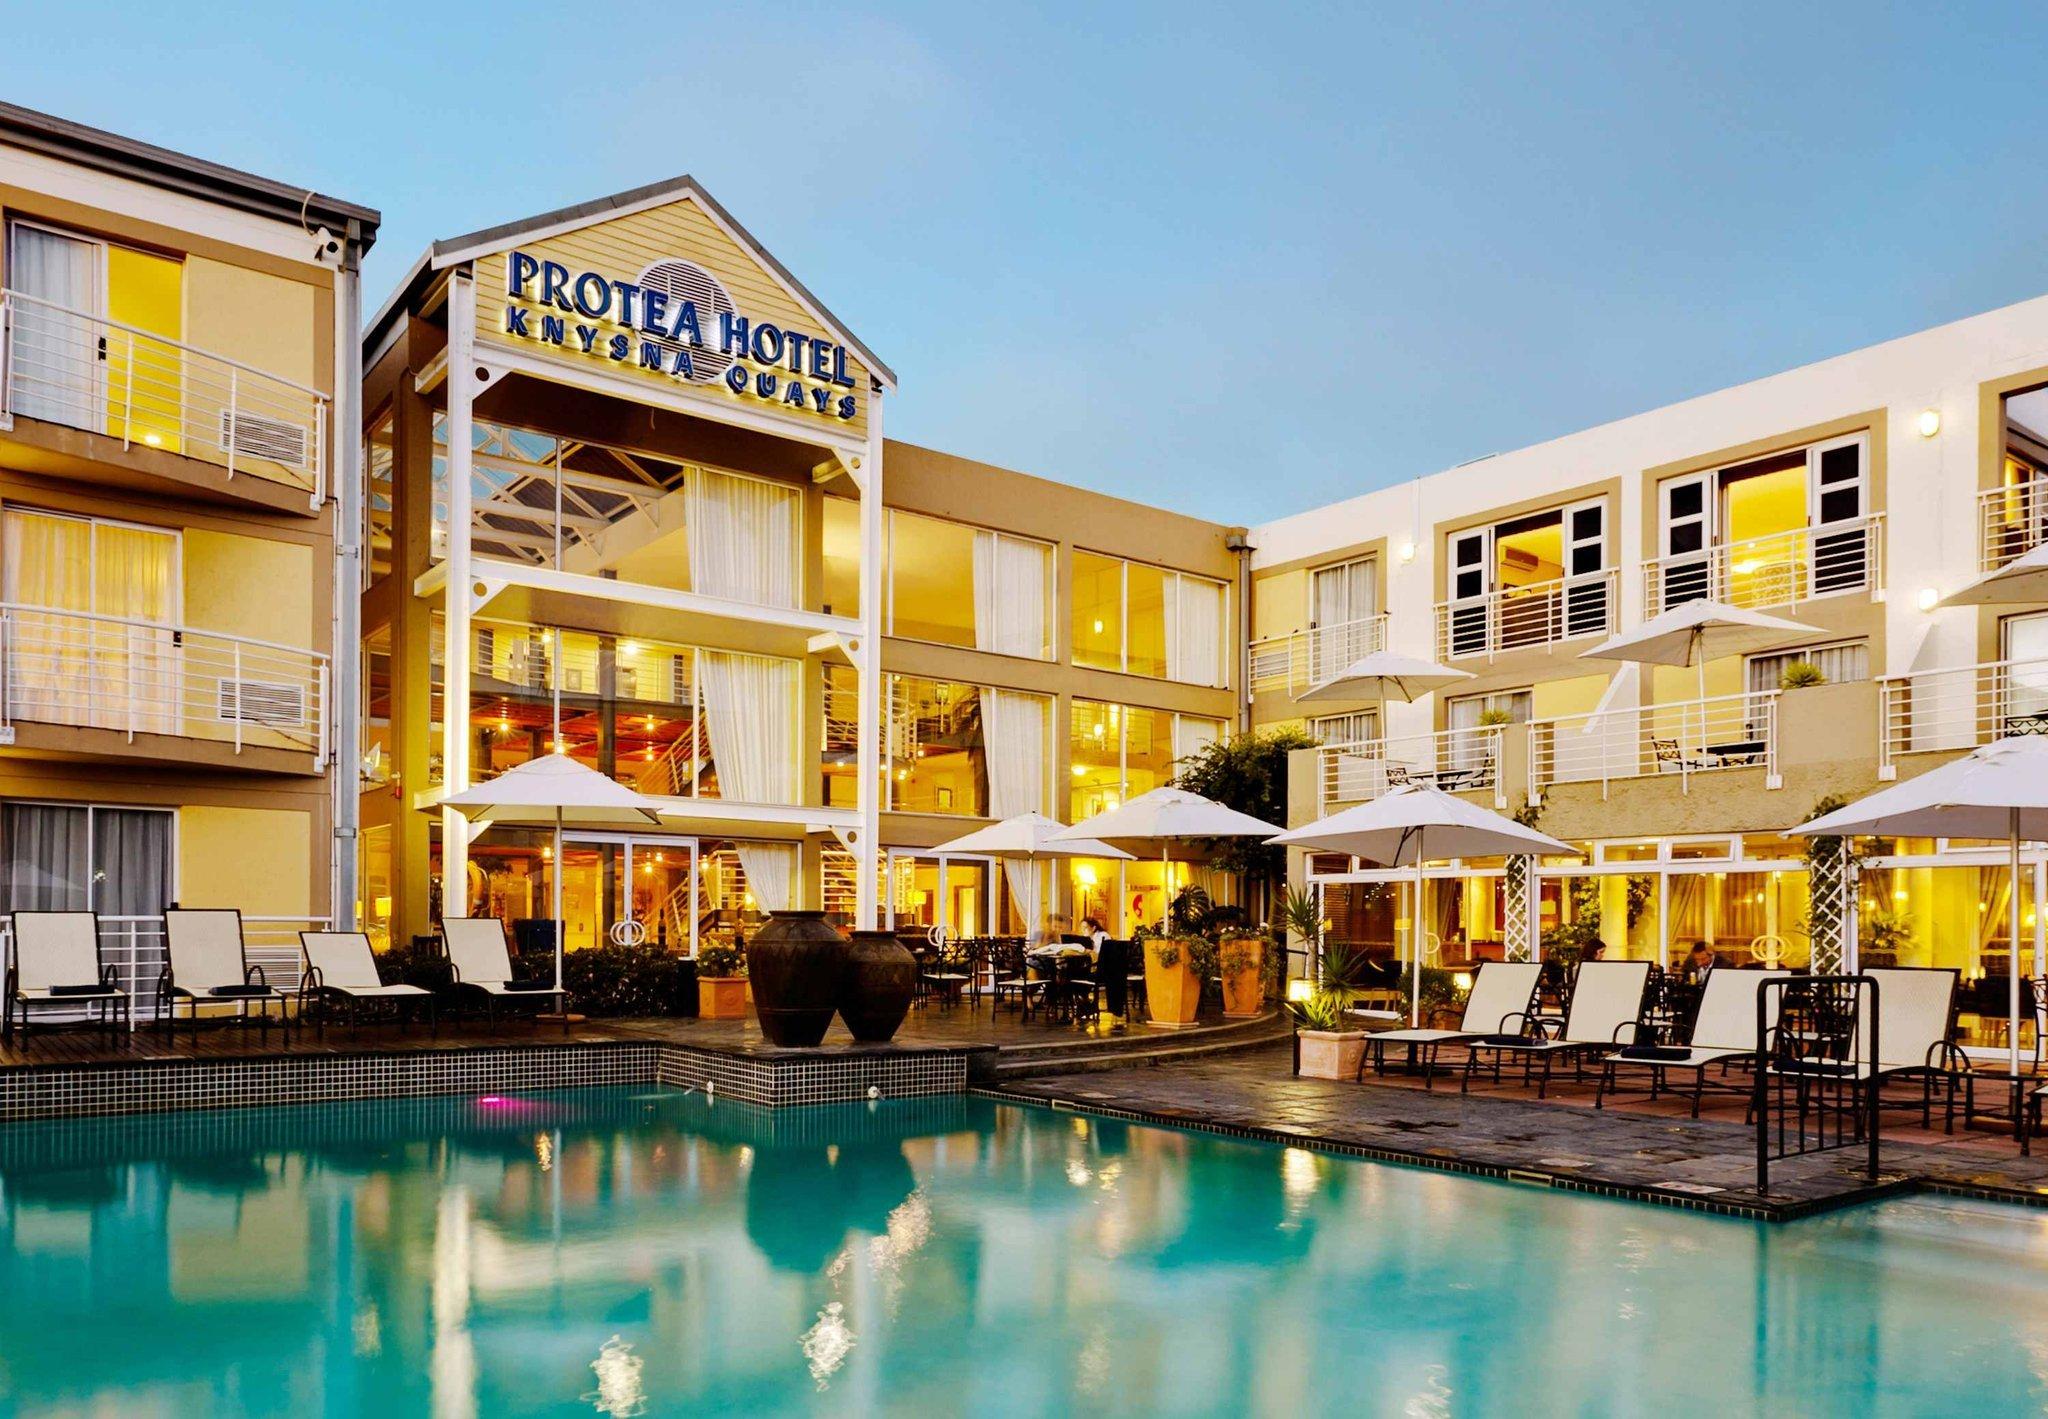 Protea Hotel Knysna Quays